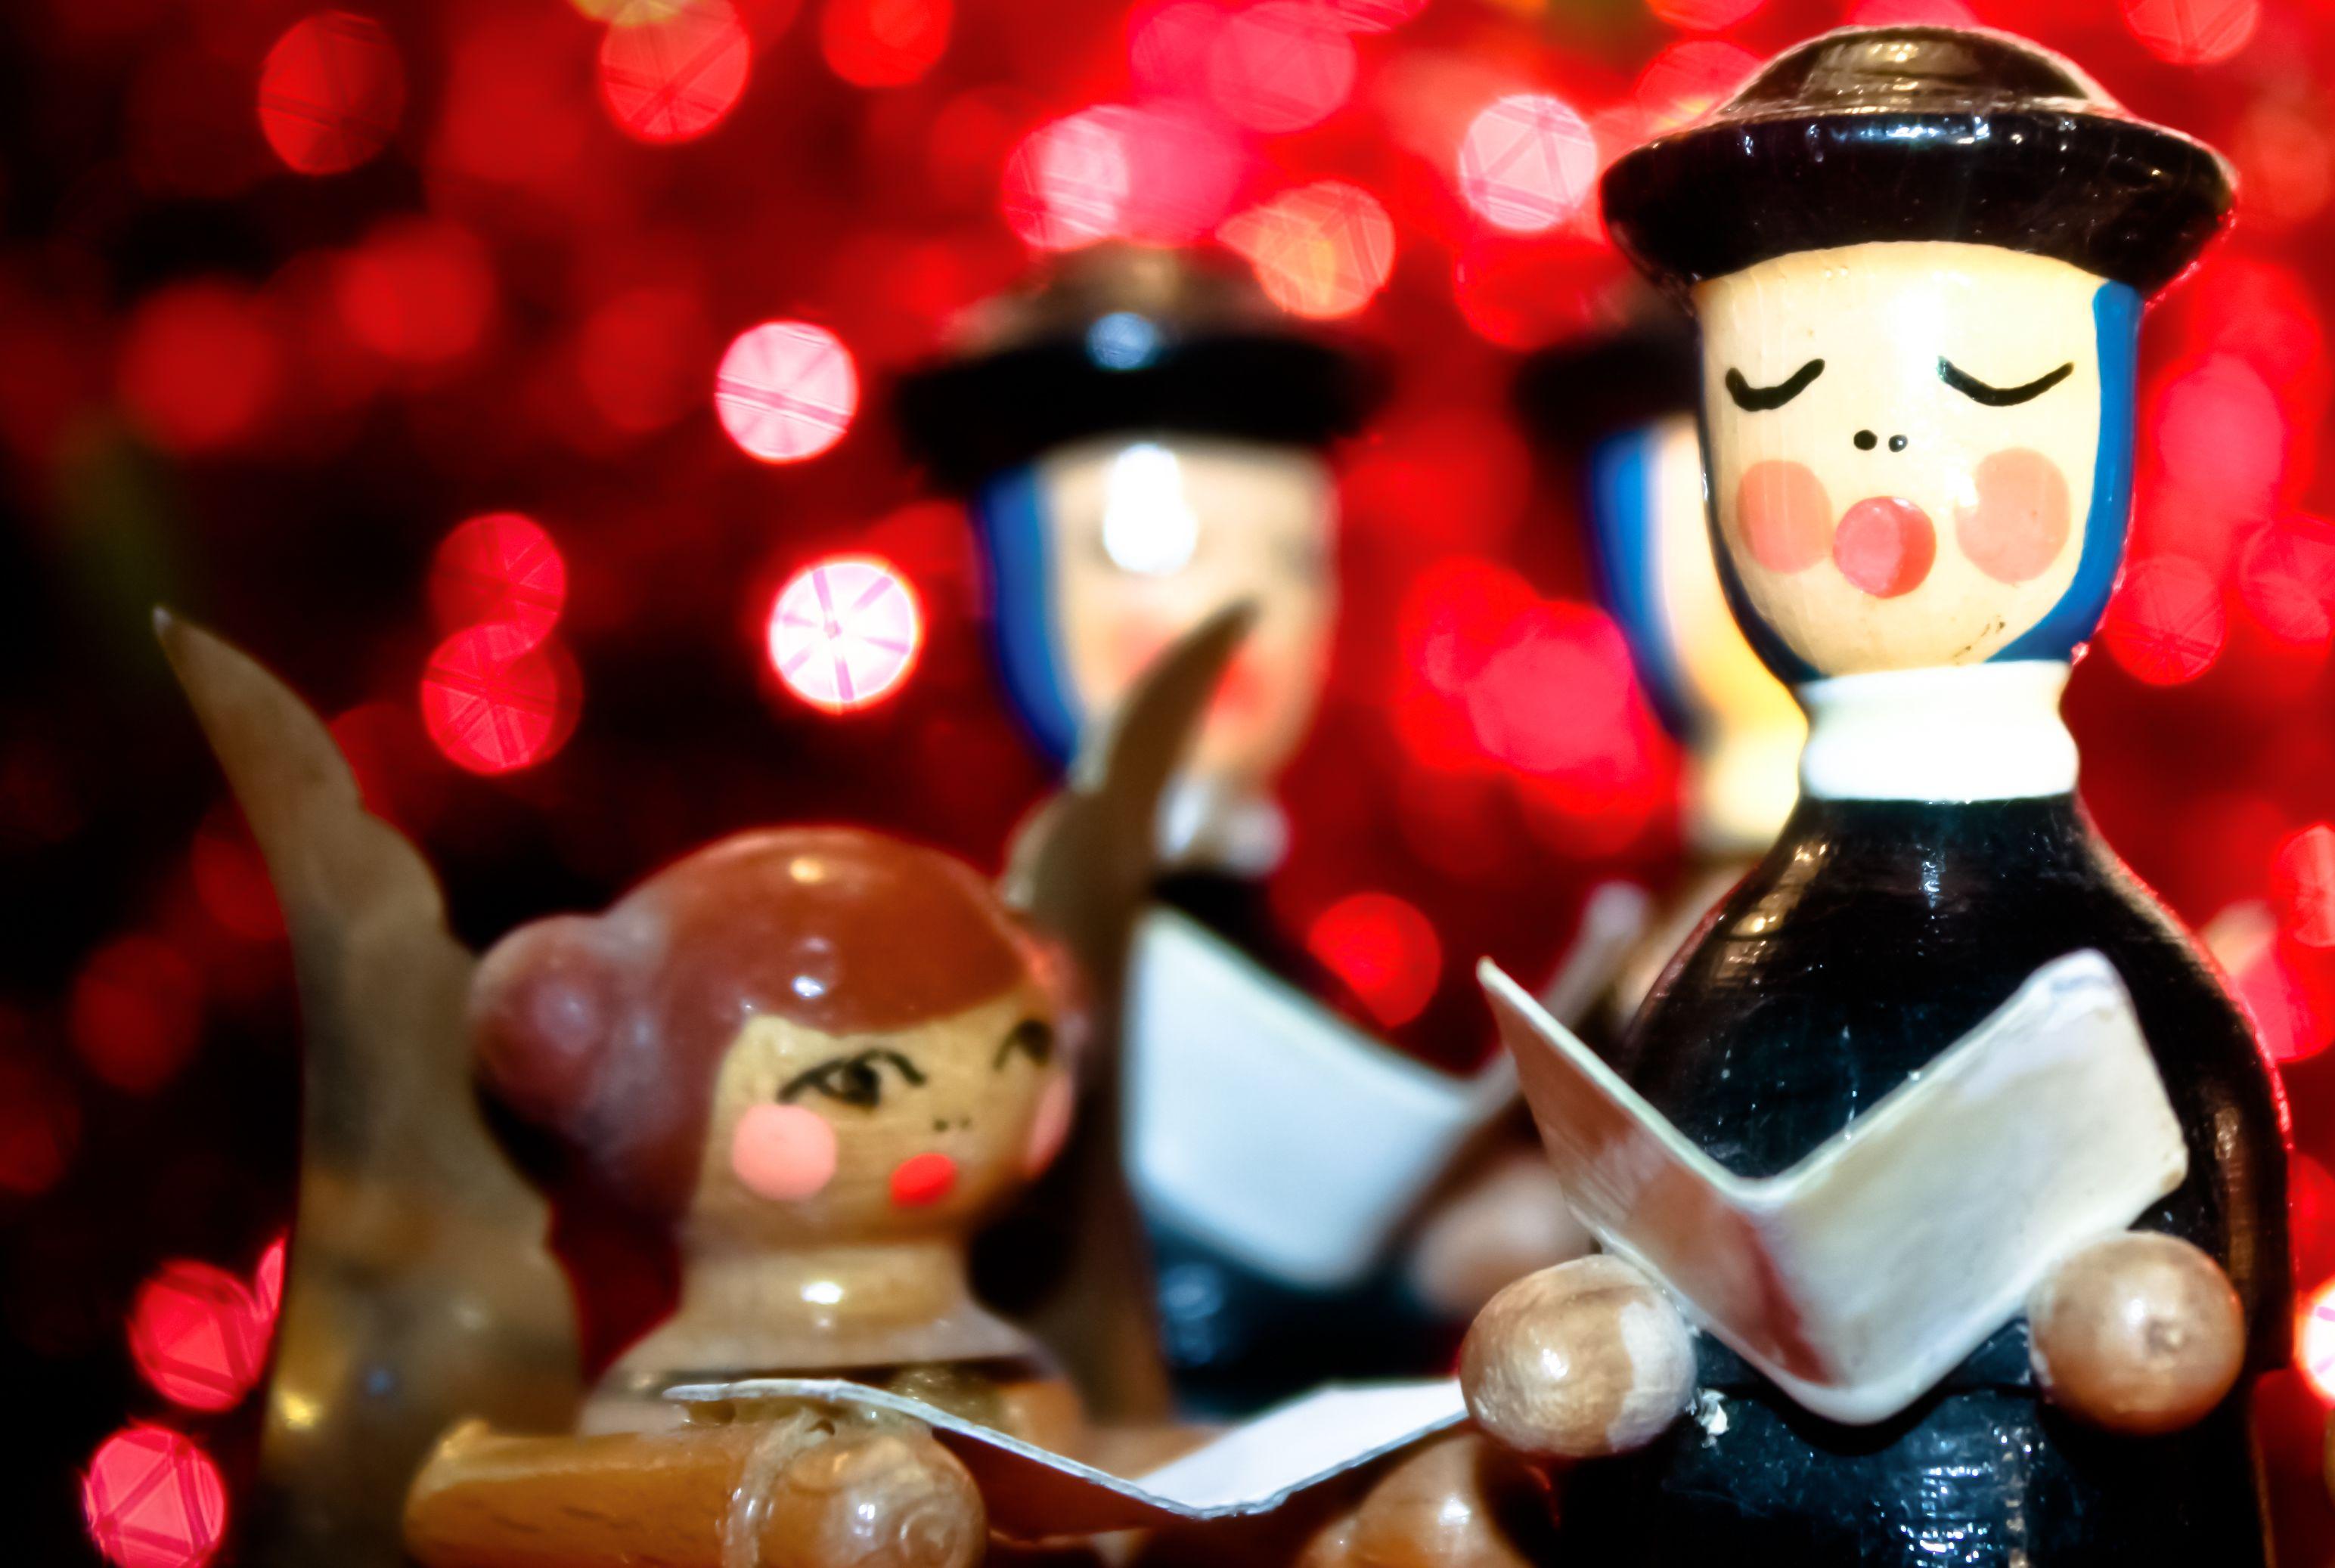 Merry Xmas Chris Heart Shaped Mini Tin Gift filled with mini coloured chocolates perfect card alternative for Chris Fun Festive Santa Design